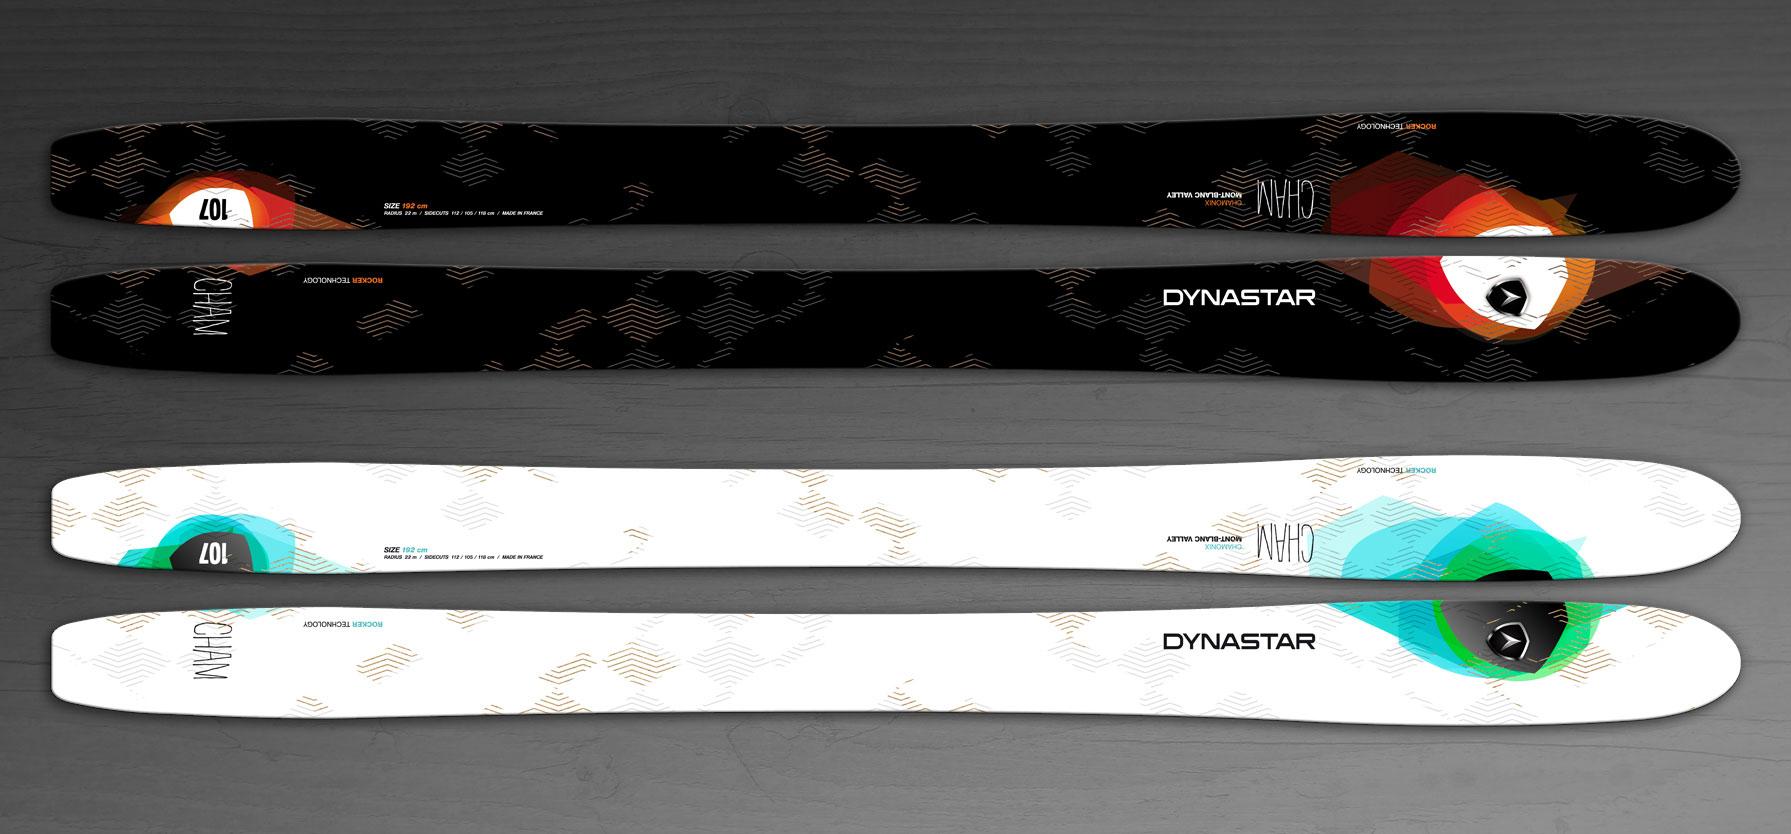 dynastar-skis-powertrack-03